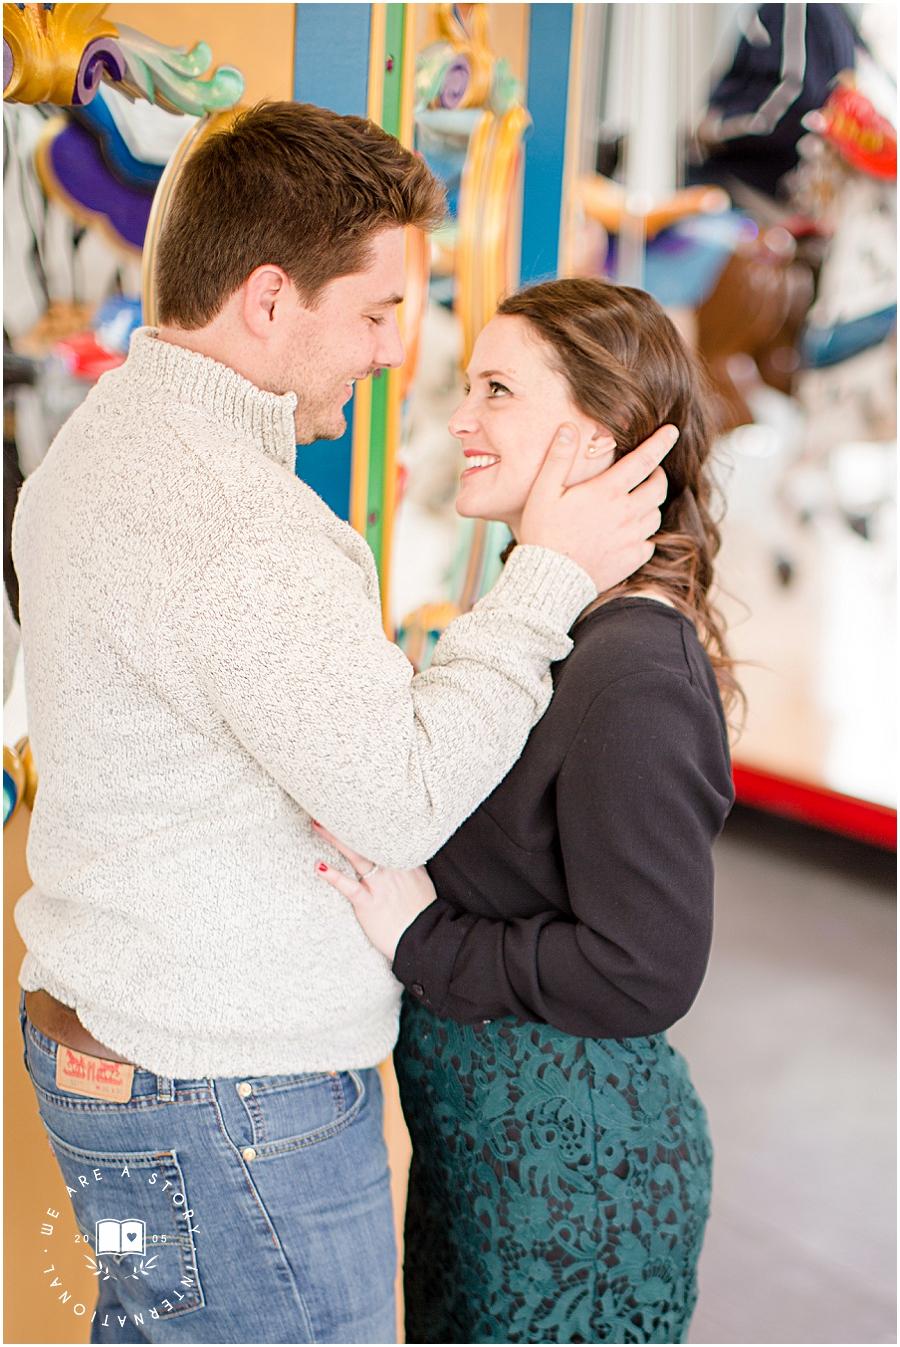 Cincinnati Wedding Photographer_We Are A Story_Molly & Matt Engagement Session_2523.jpg